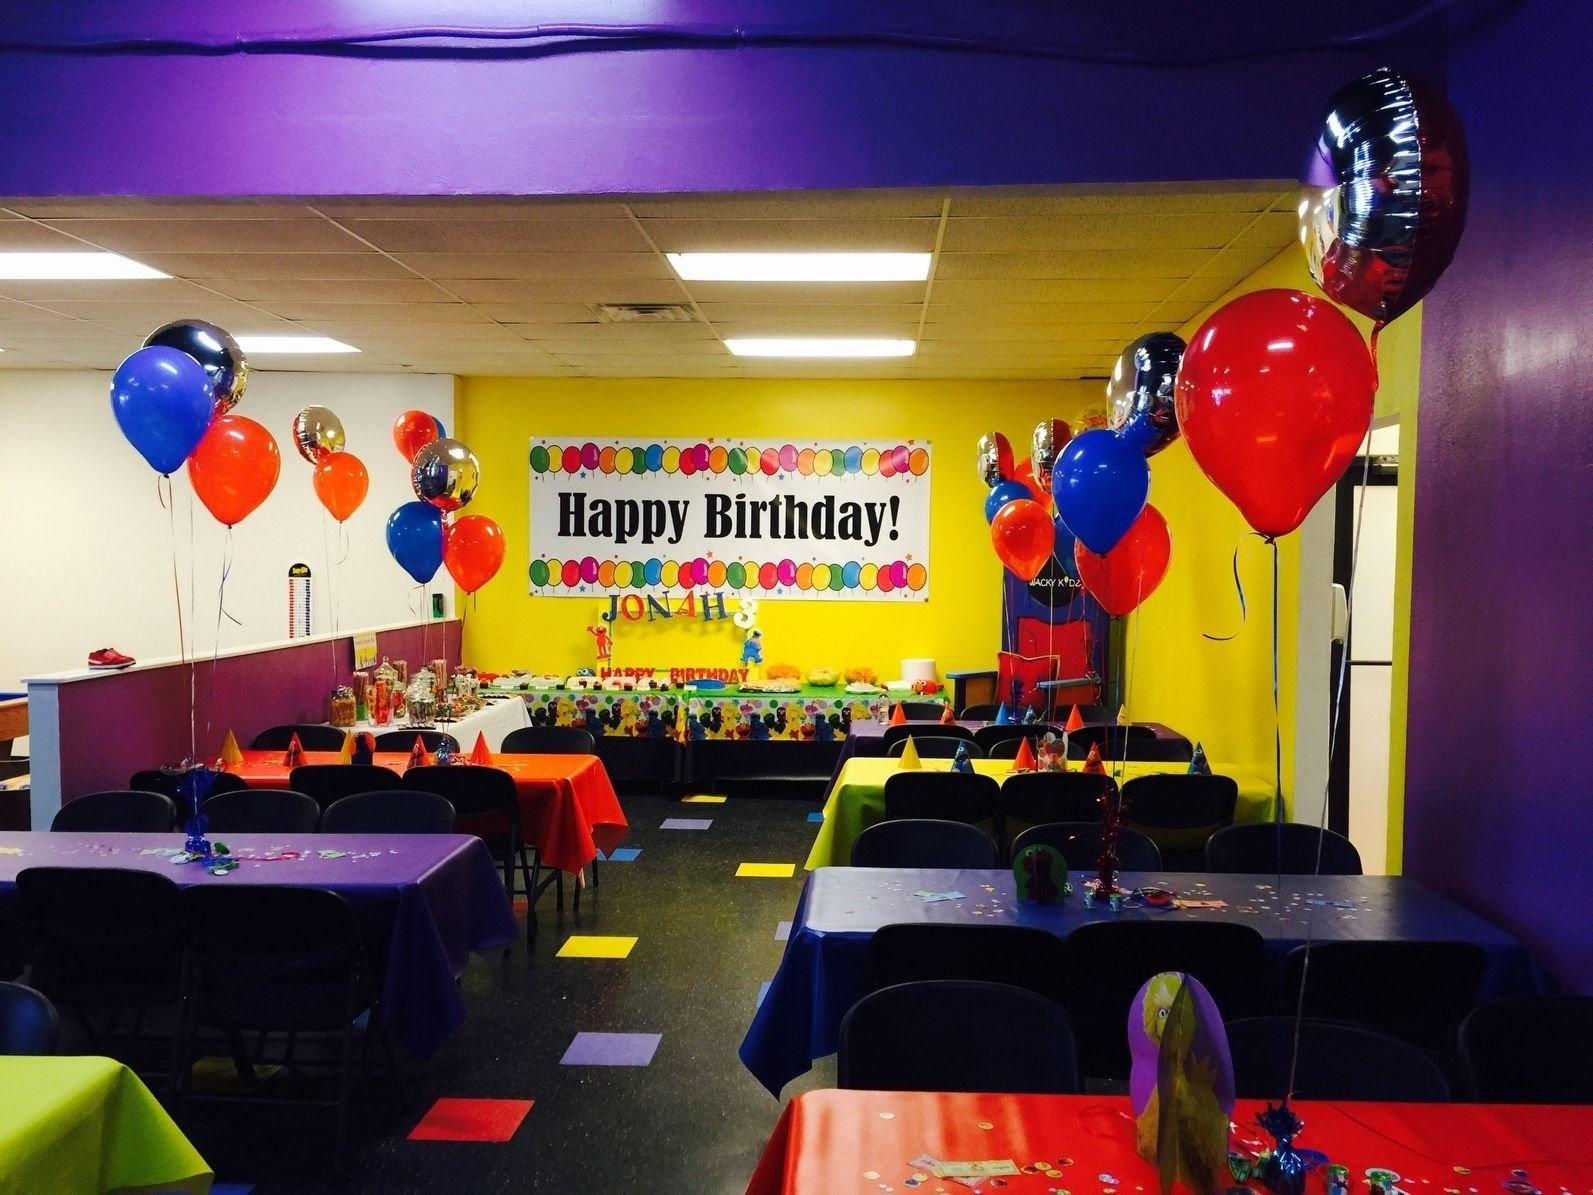 10 Stylish Birthday Party Ideas San Antonio best place for kids birthday party san antonio 7 awesome birthday 2020